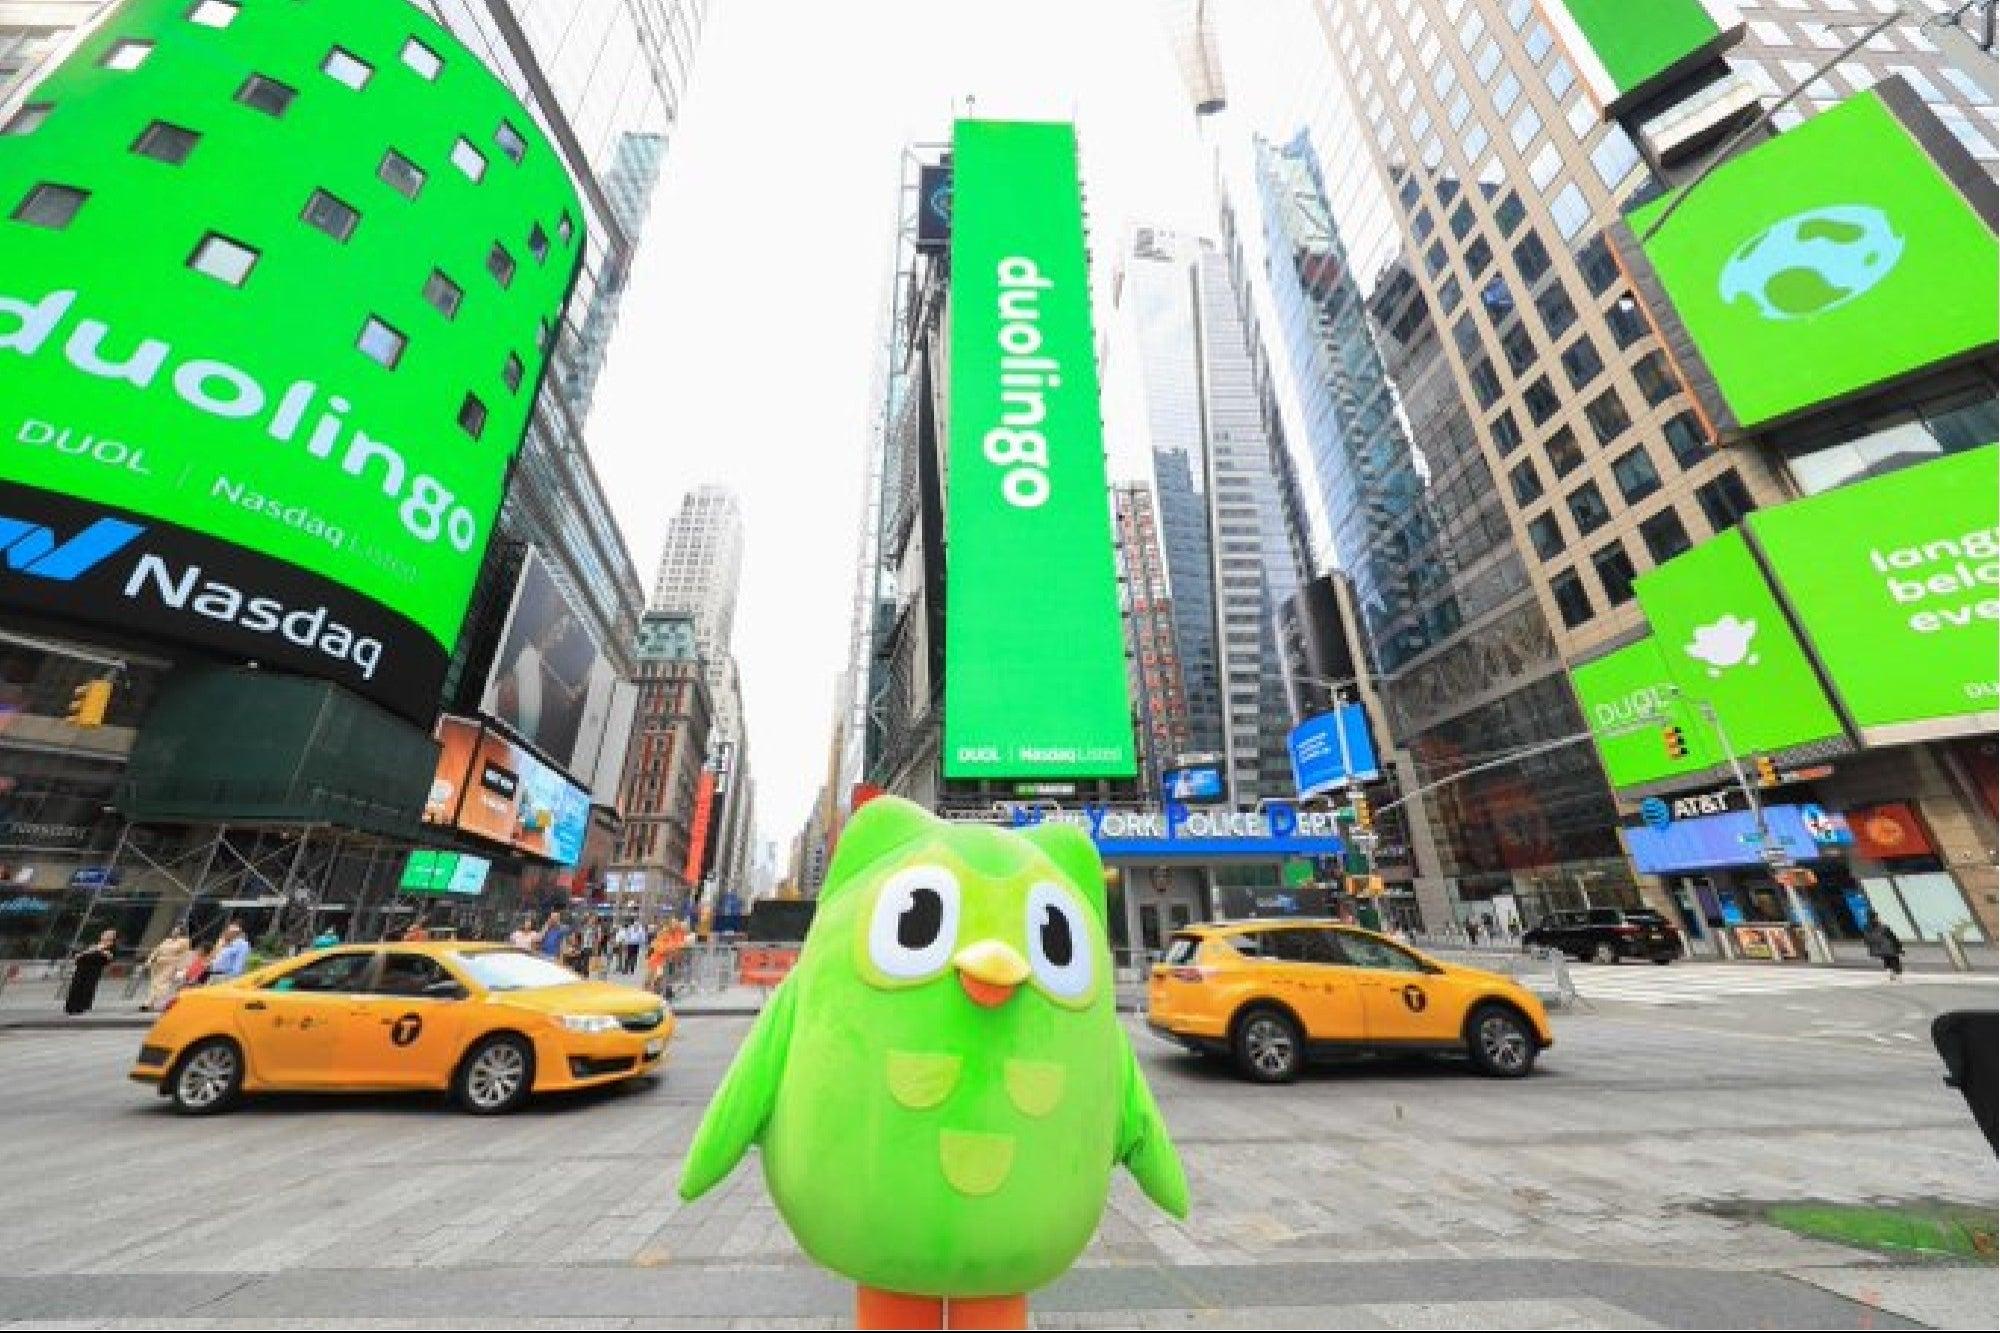 Duolingo shares soared 39% on its Nasdaq debut, but did the language app maintain its winning streak?